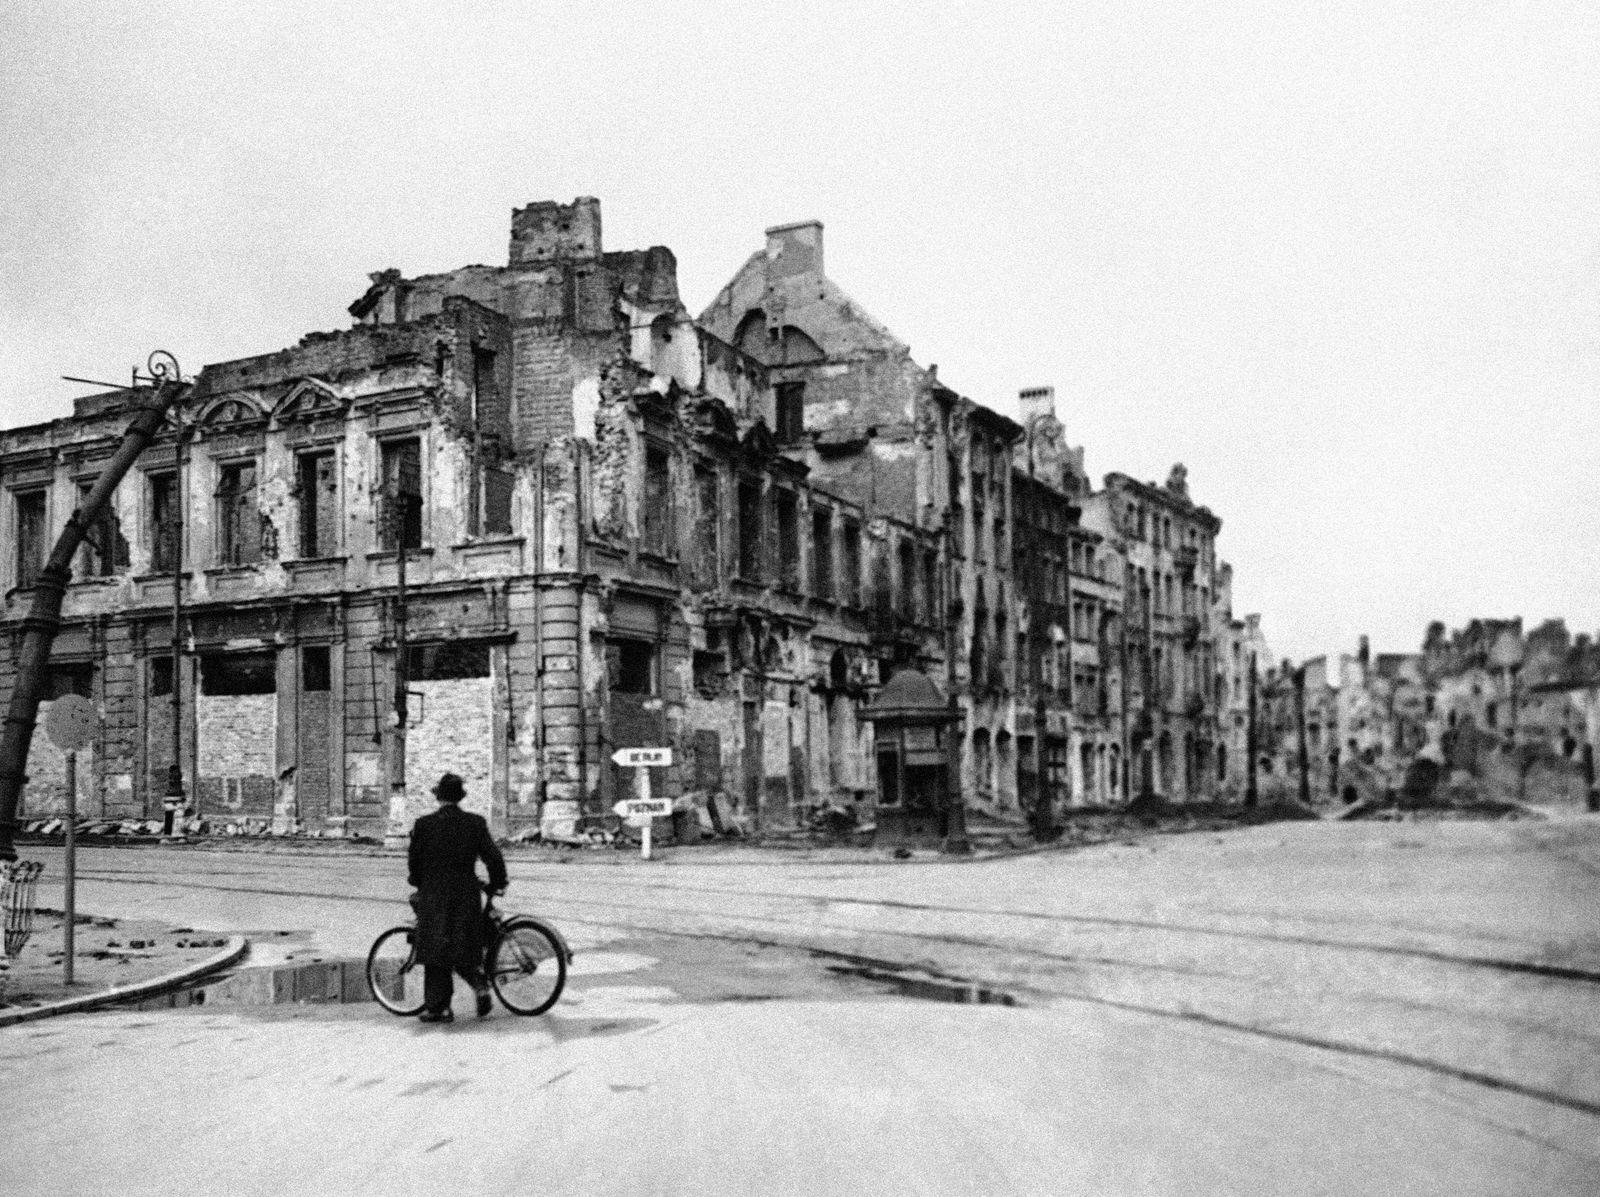 Post WWII Poland Destruction